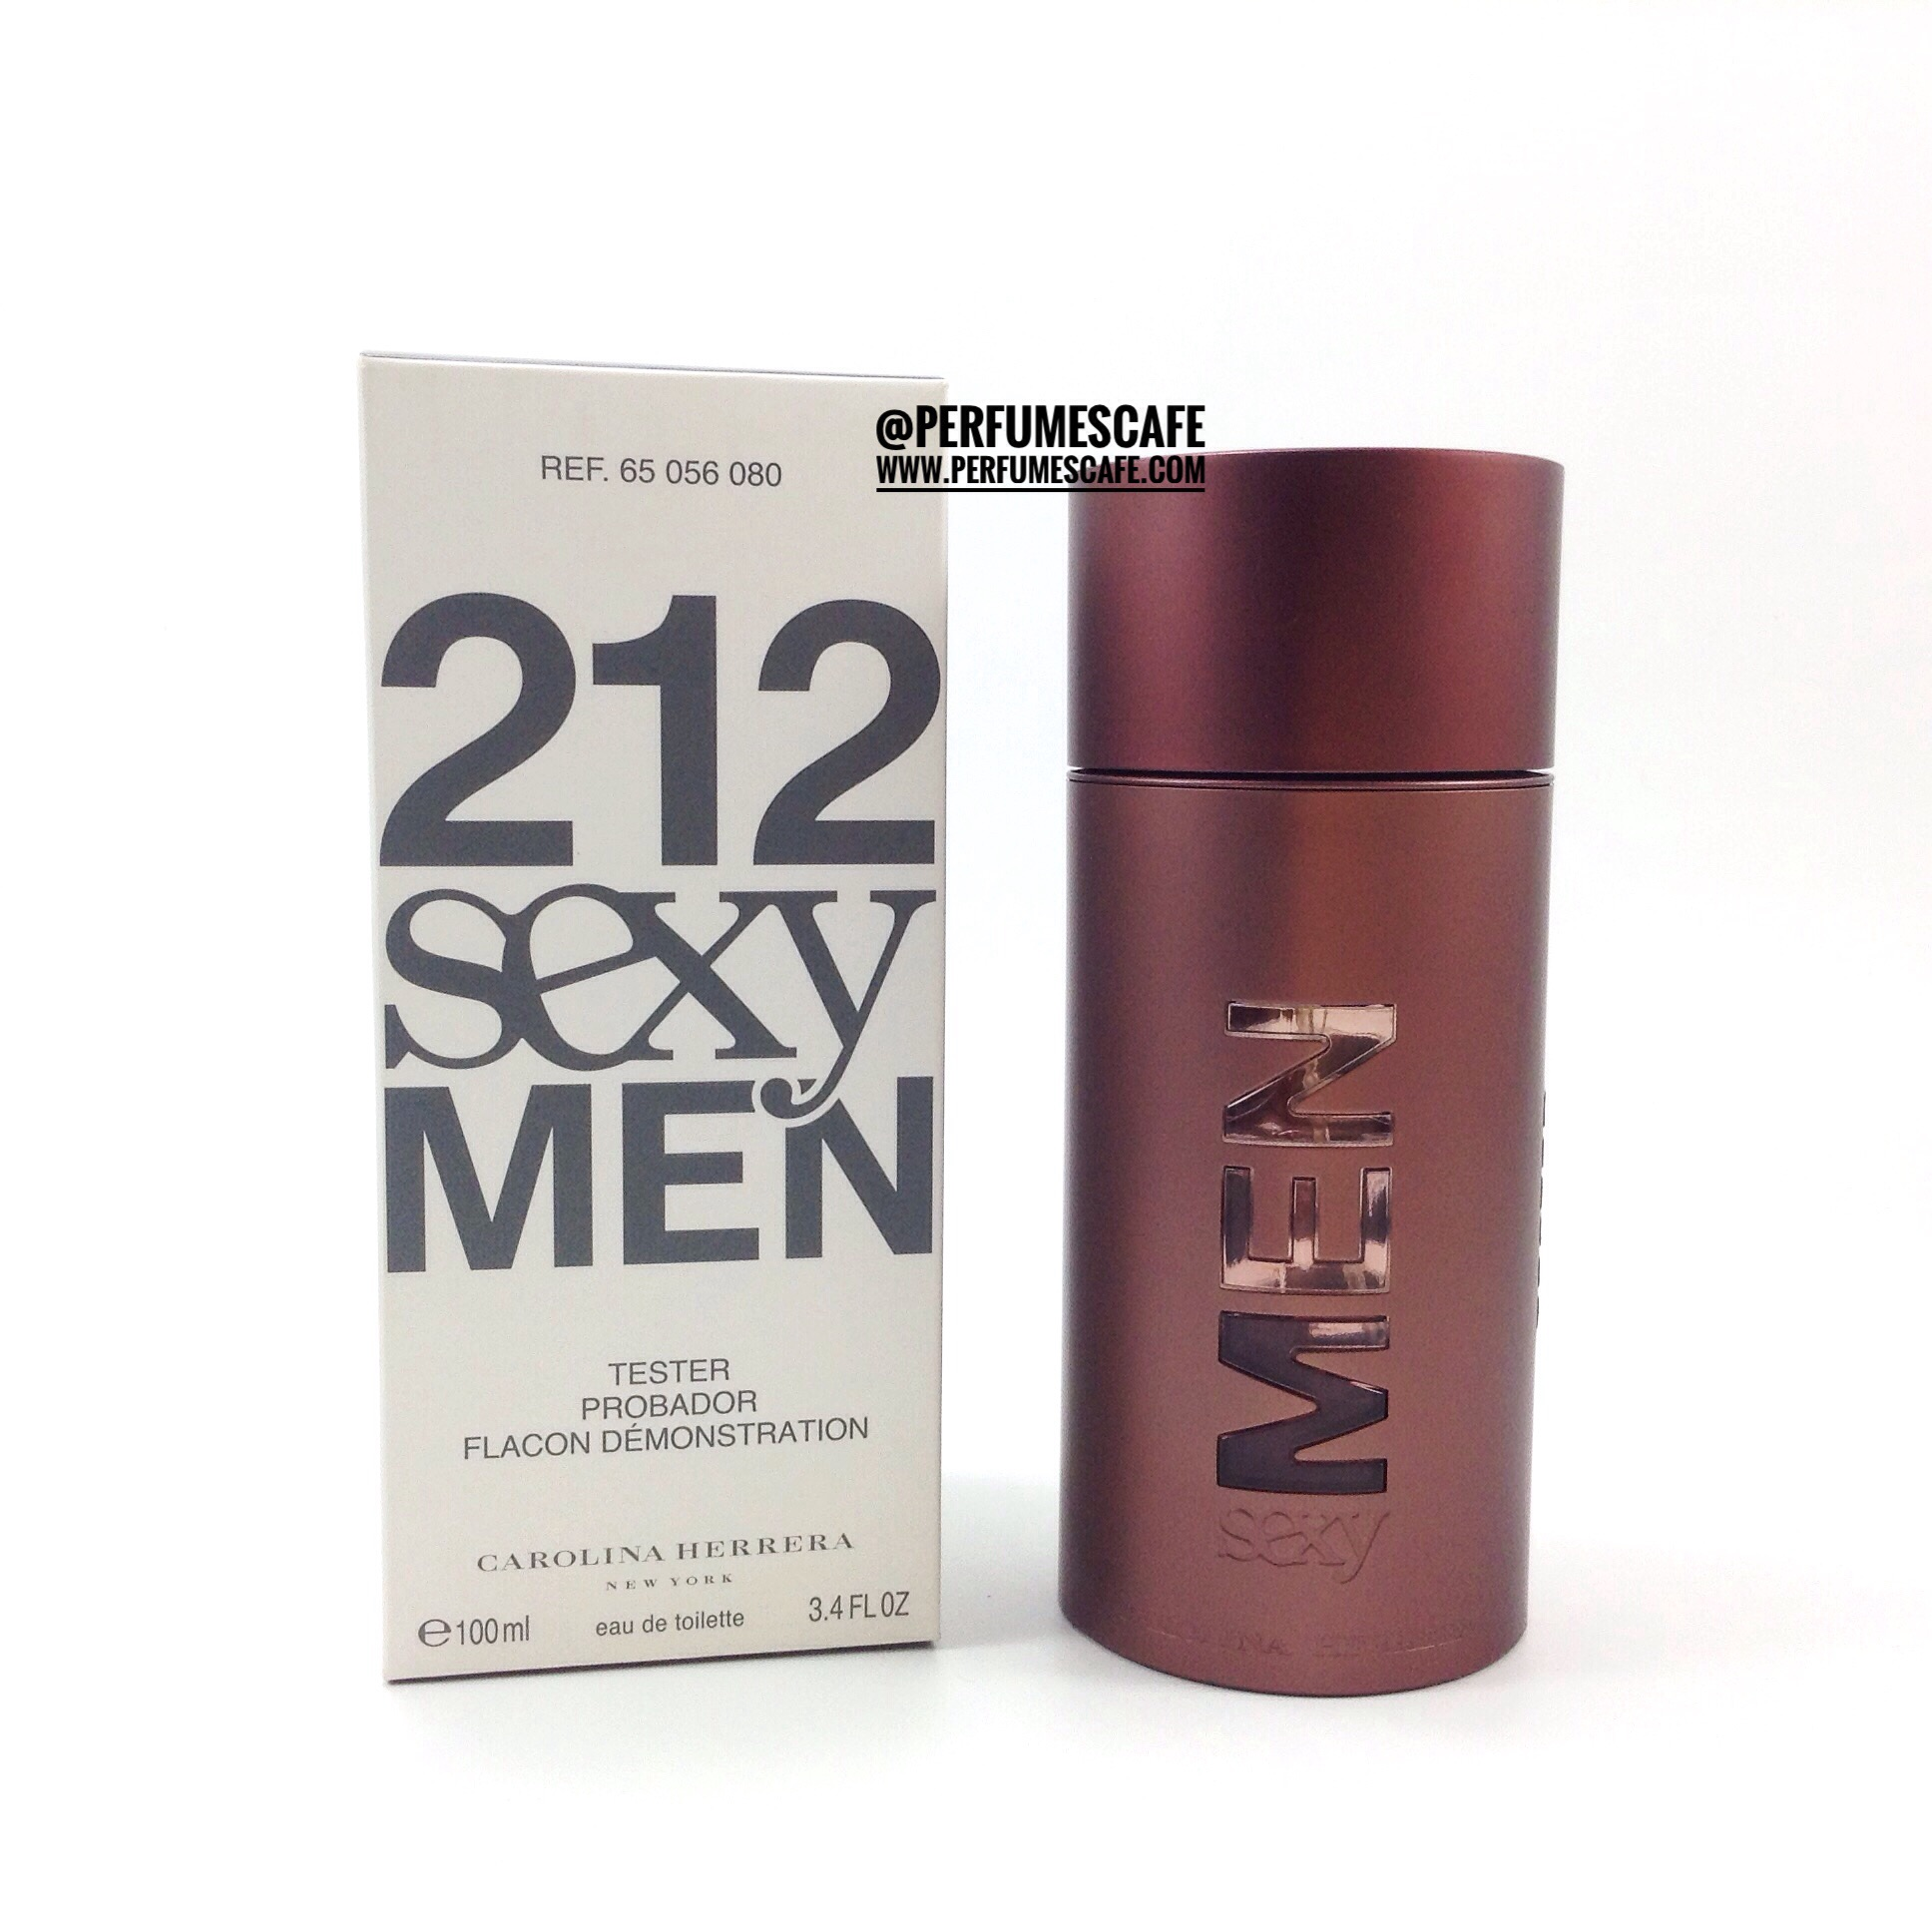 212 Sexy Men จาก Carolina Herrera Eau De Toilette ขนาด 100 ml กล่องเทสเตอร์